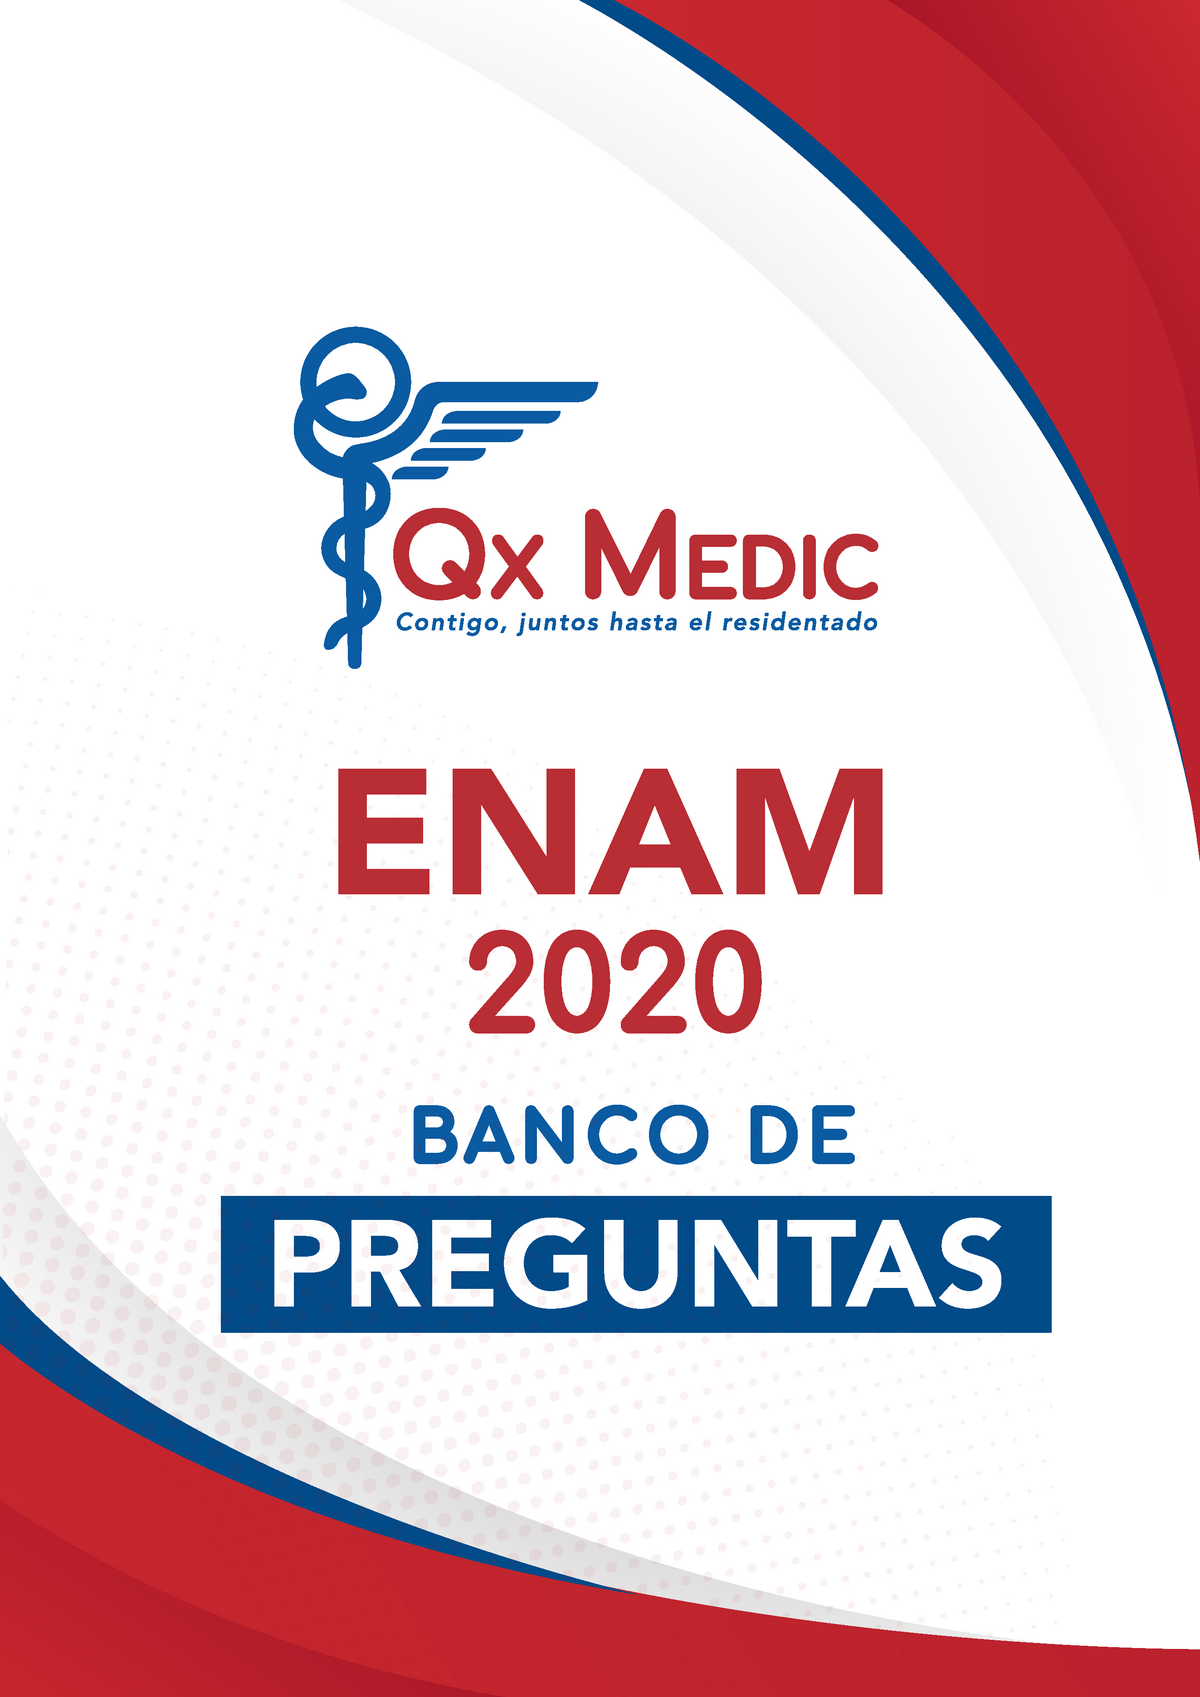 Examen 2020 Rociplacion De Preguntas Enam Qx Medic 2020 Studocu